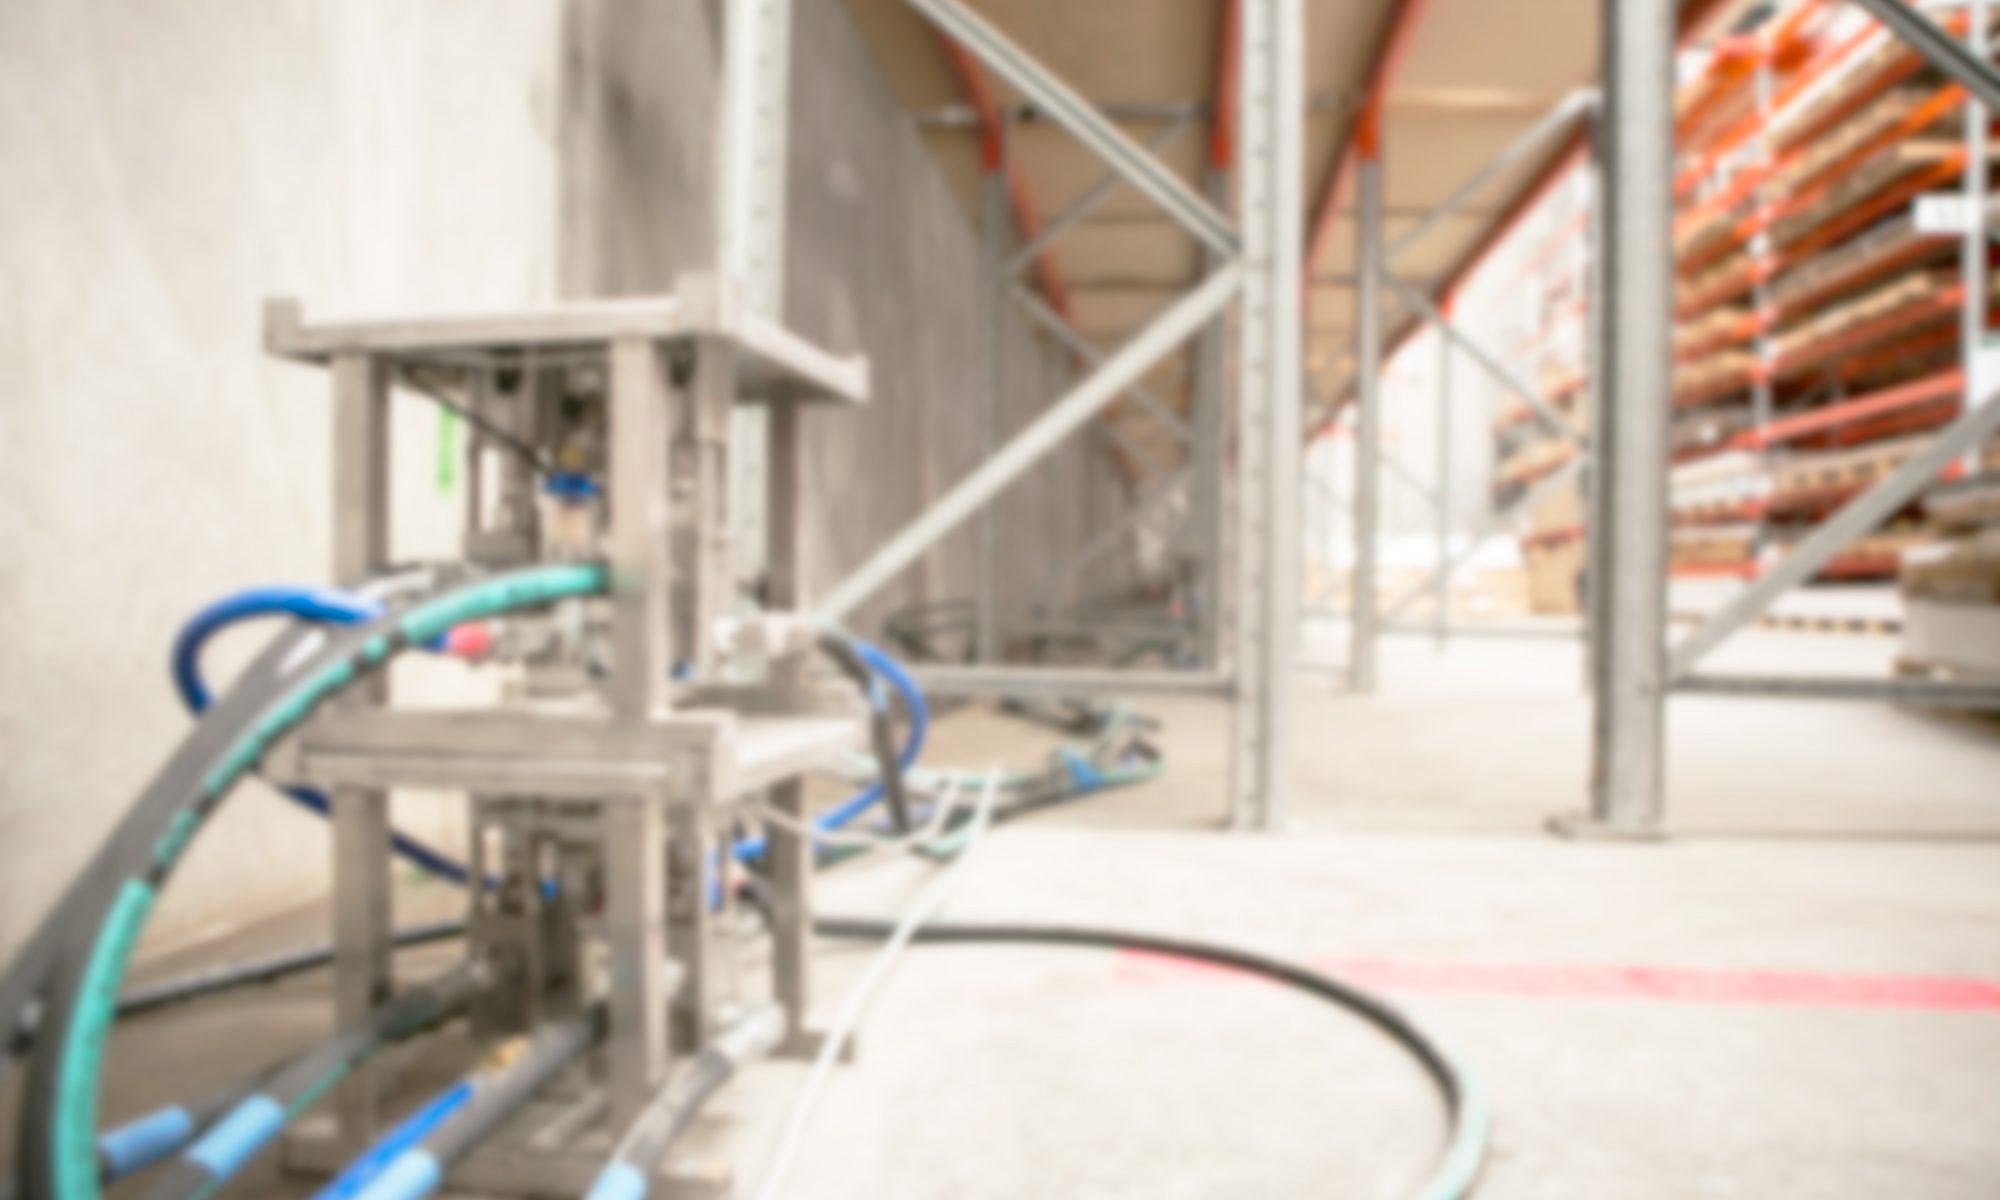 JOG machine in a warehouse